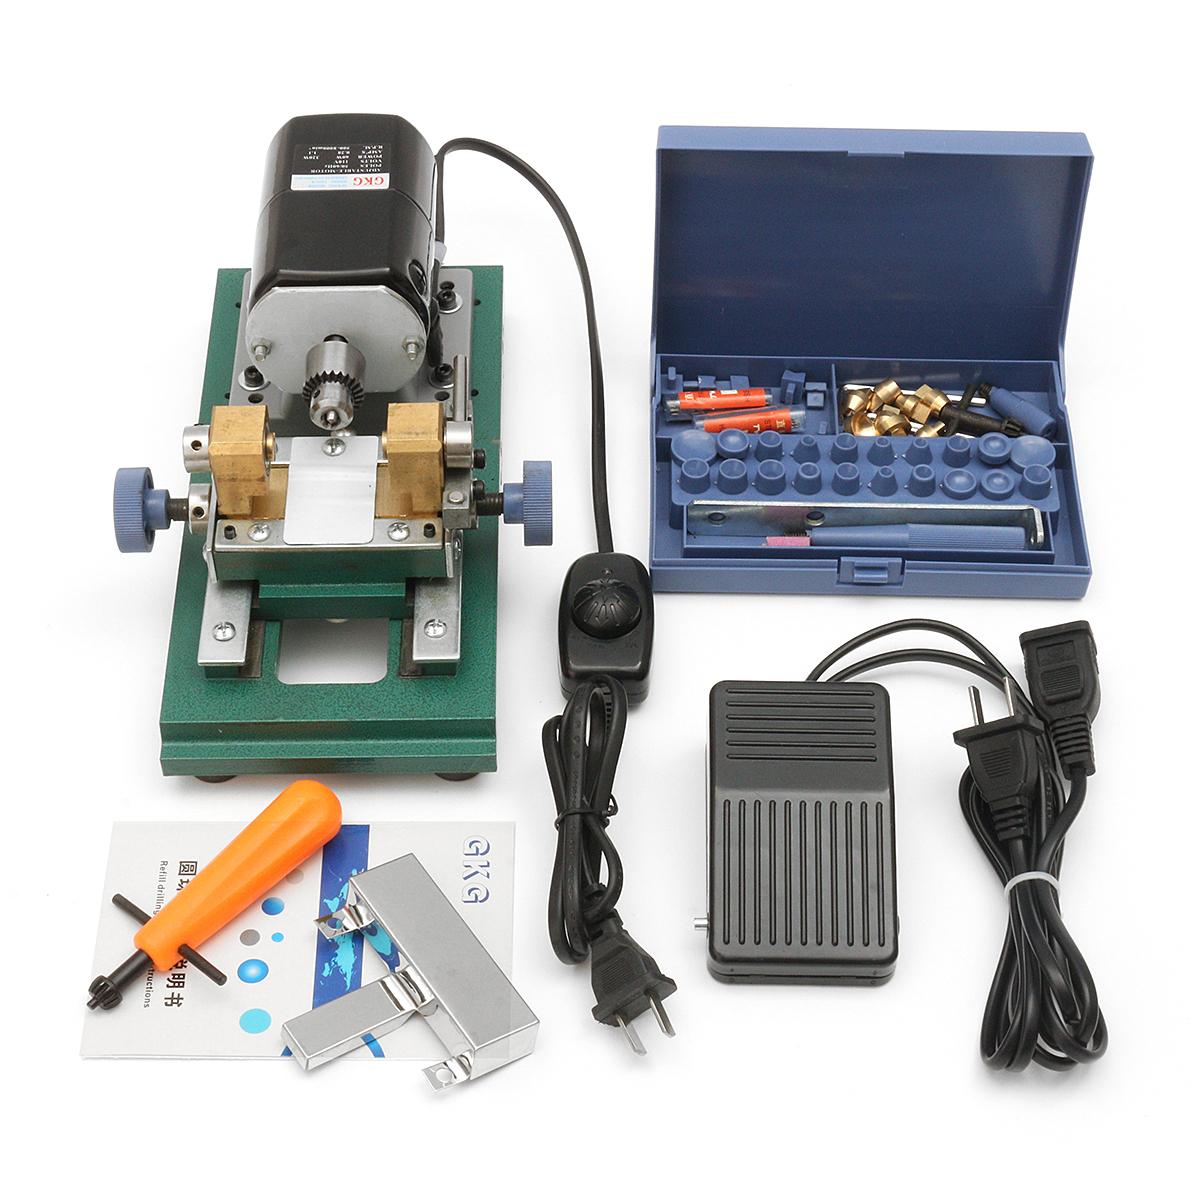 110V 220W/110V 240W / 220V 280W Pearl Drilling Holing Machine Driller Drilling Punch Tools Full Set